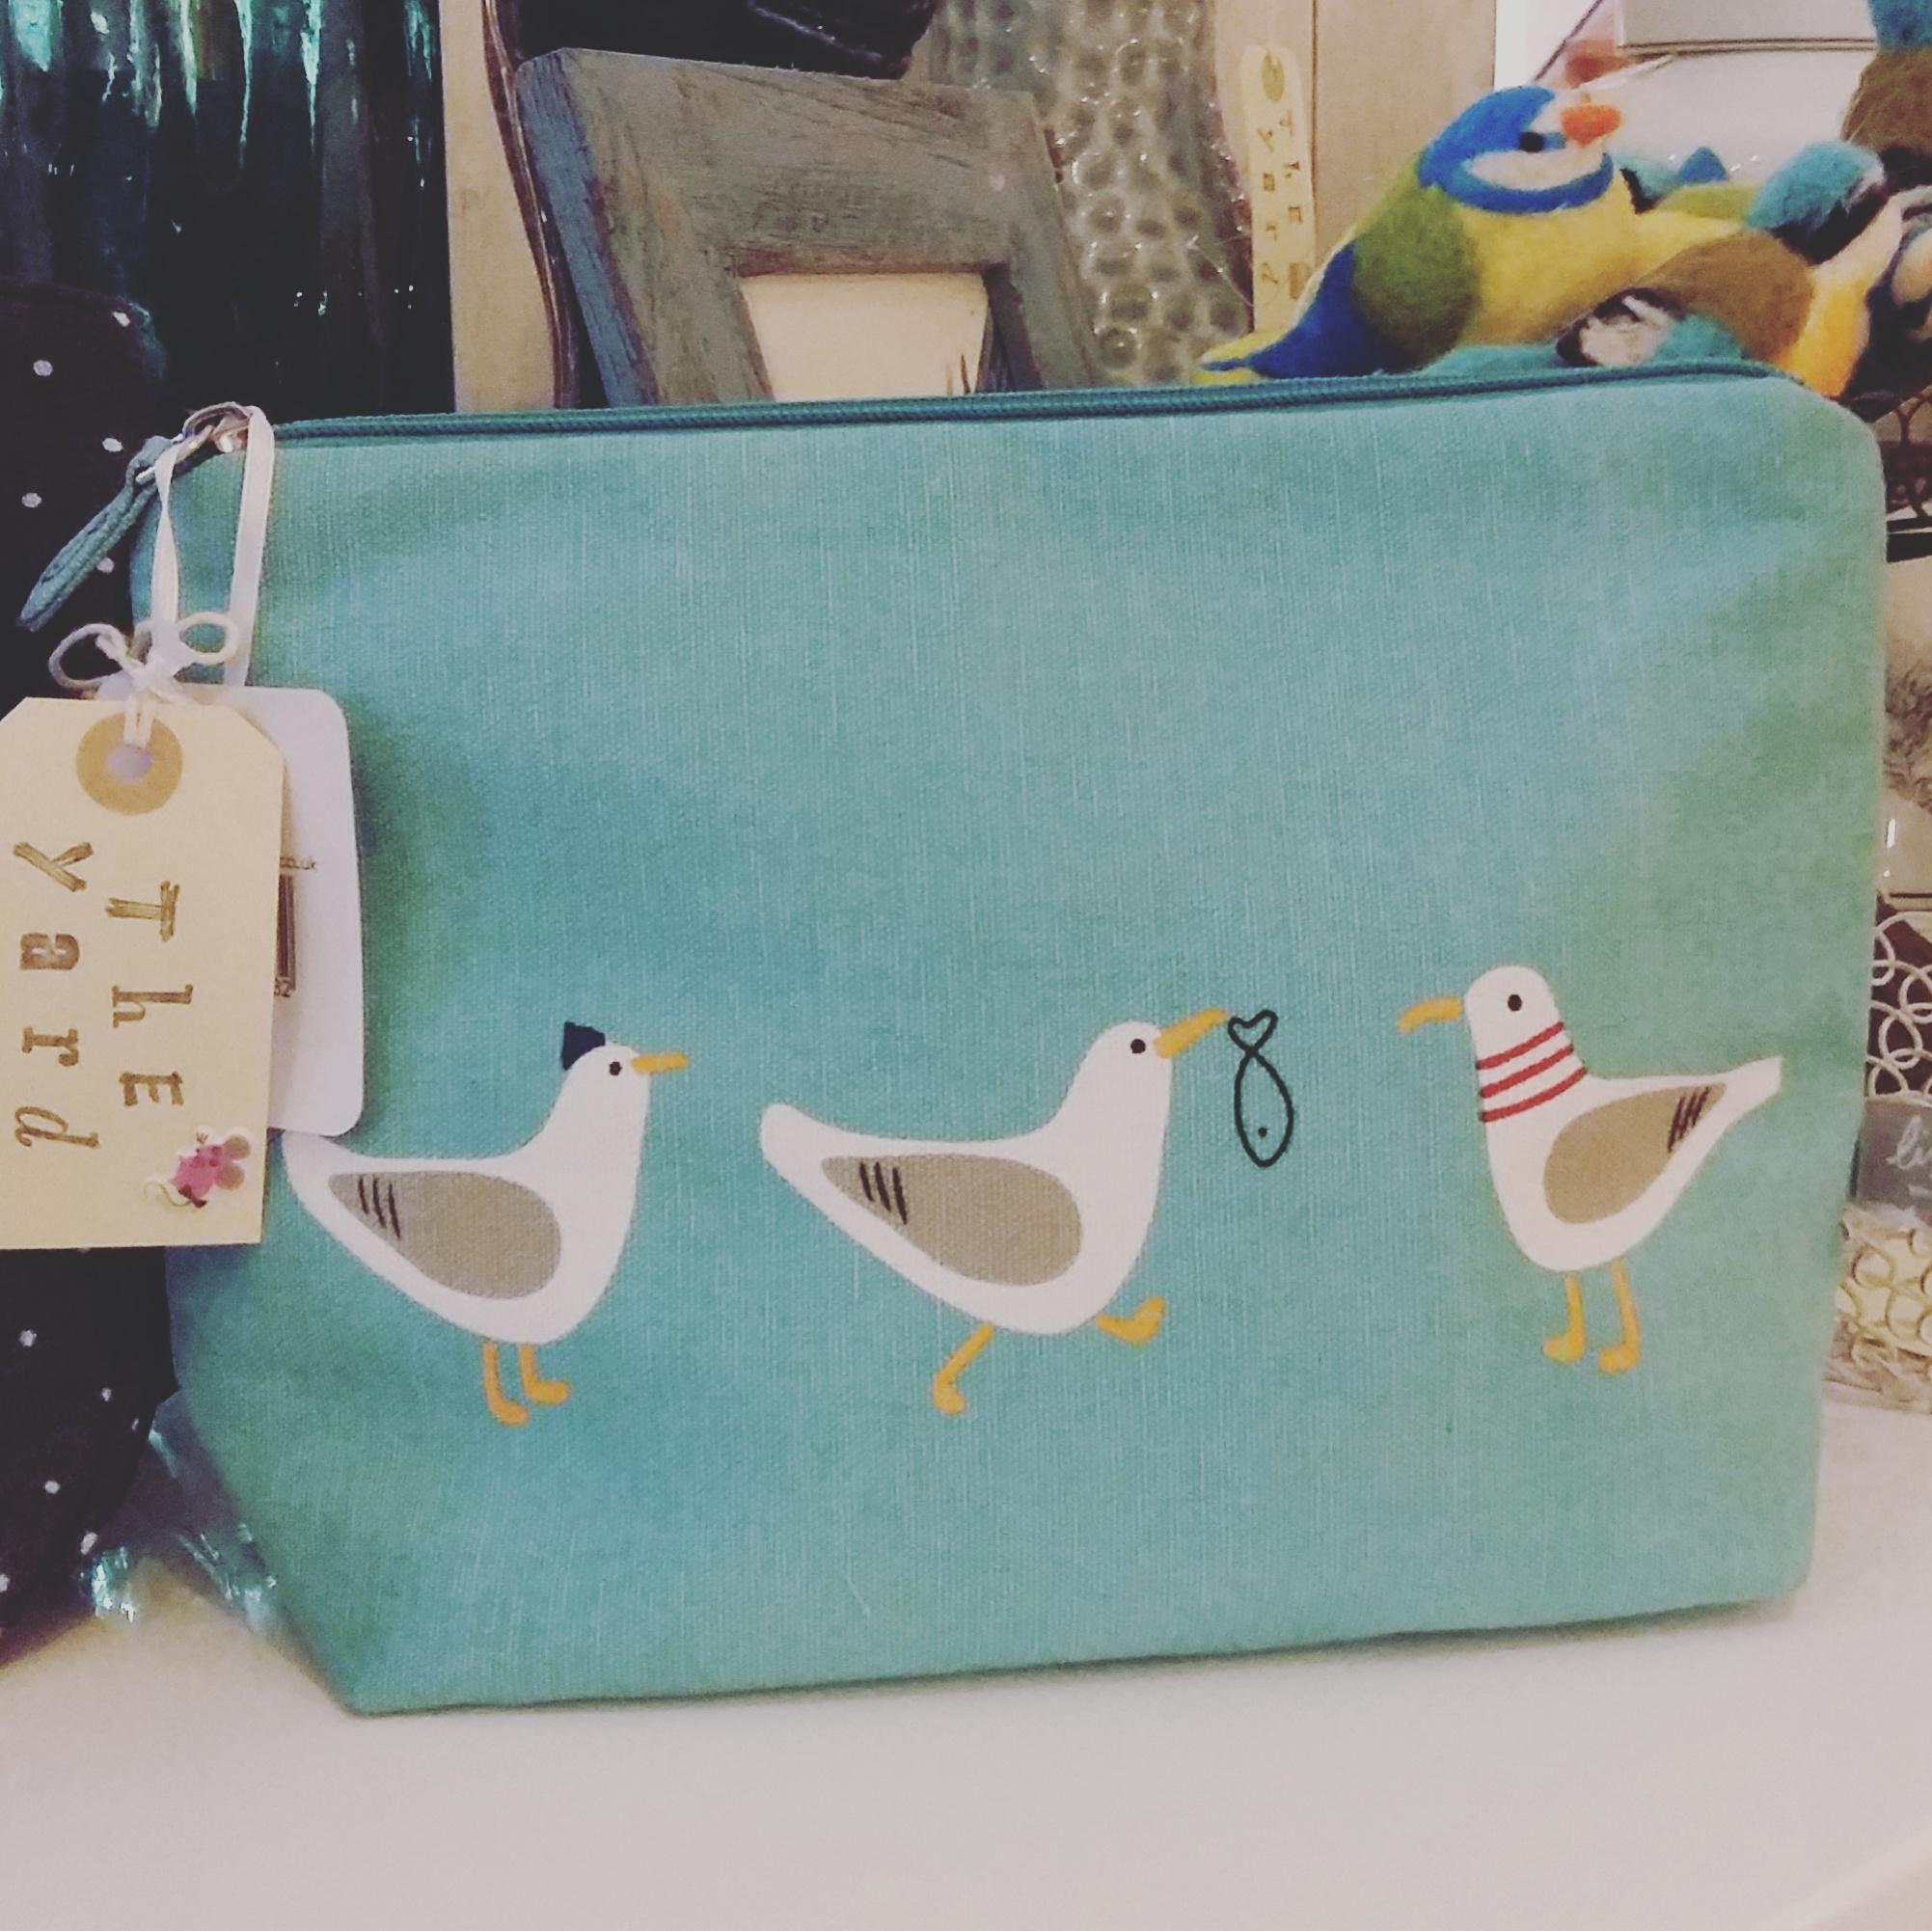 Seagull wash bag